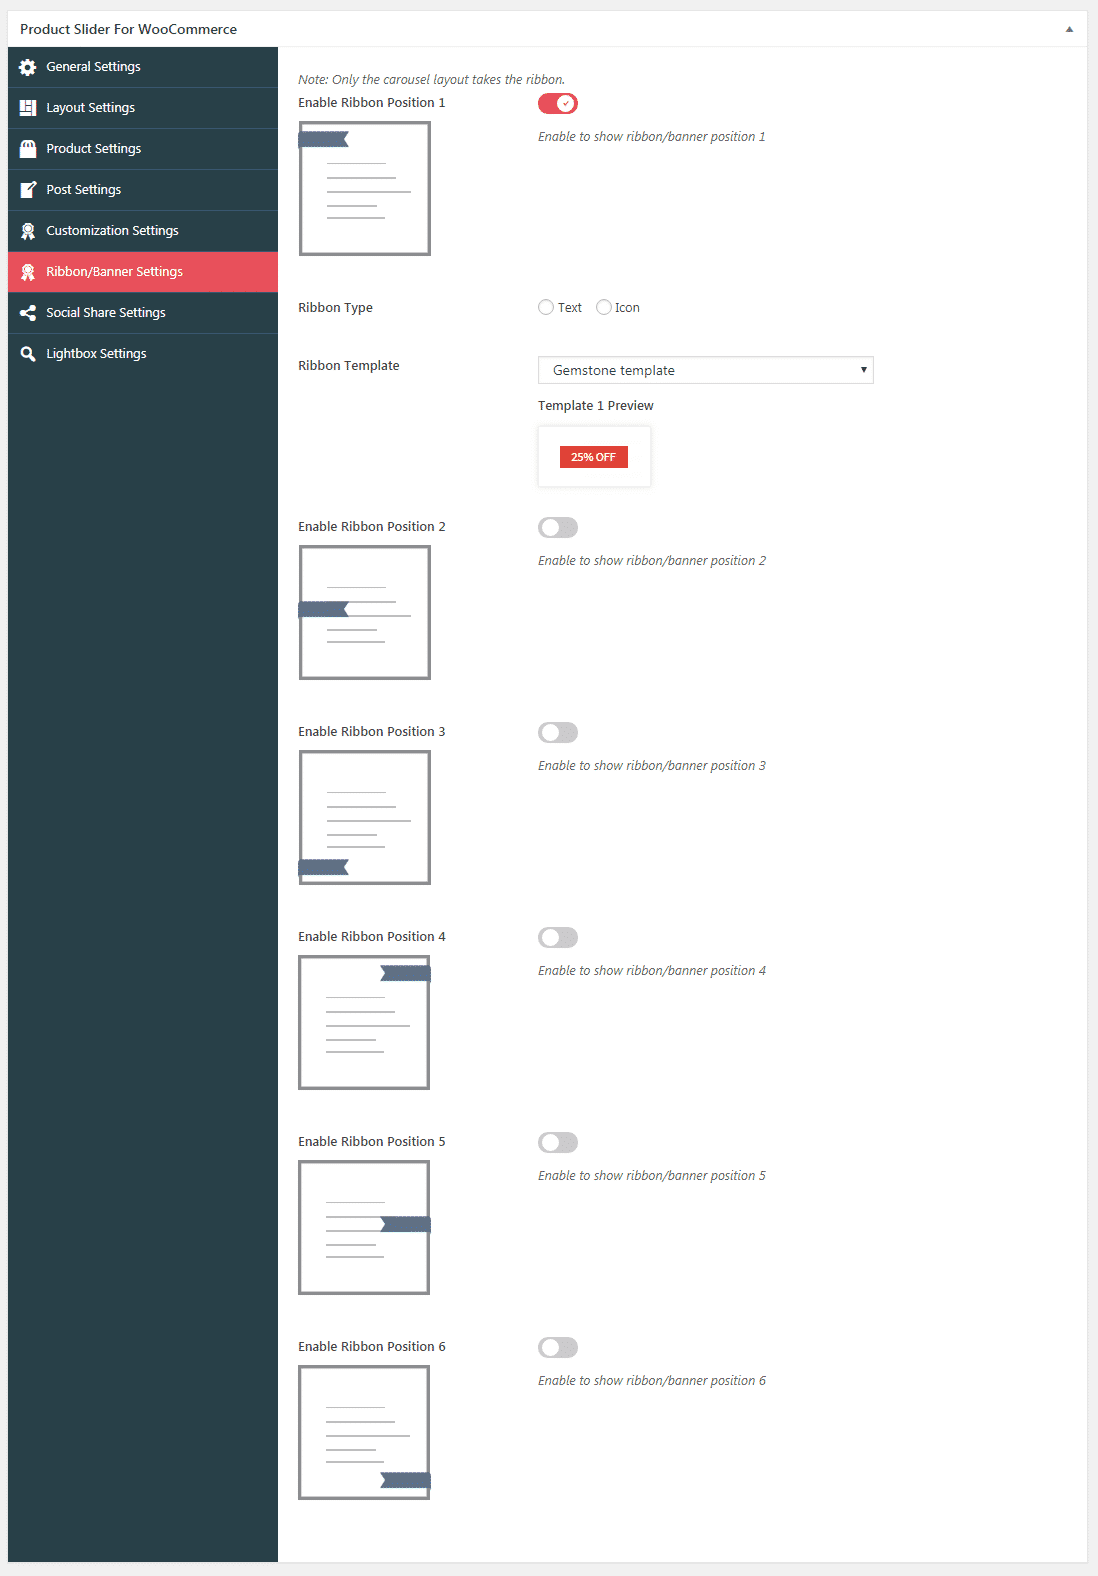 Product Slider for WooCommerce: Ribbon Settings